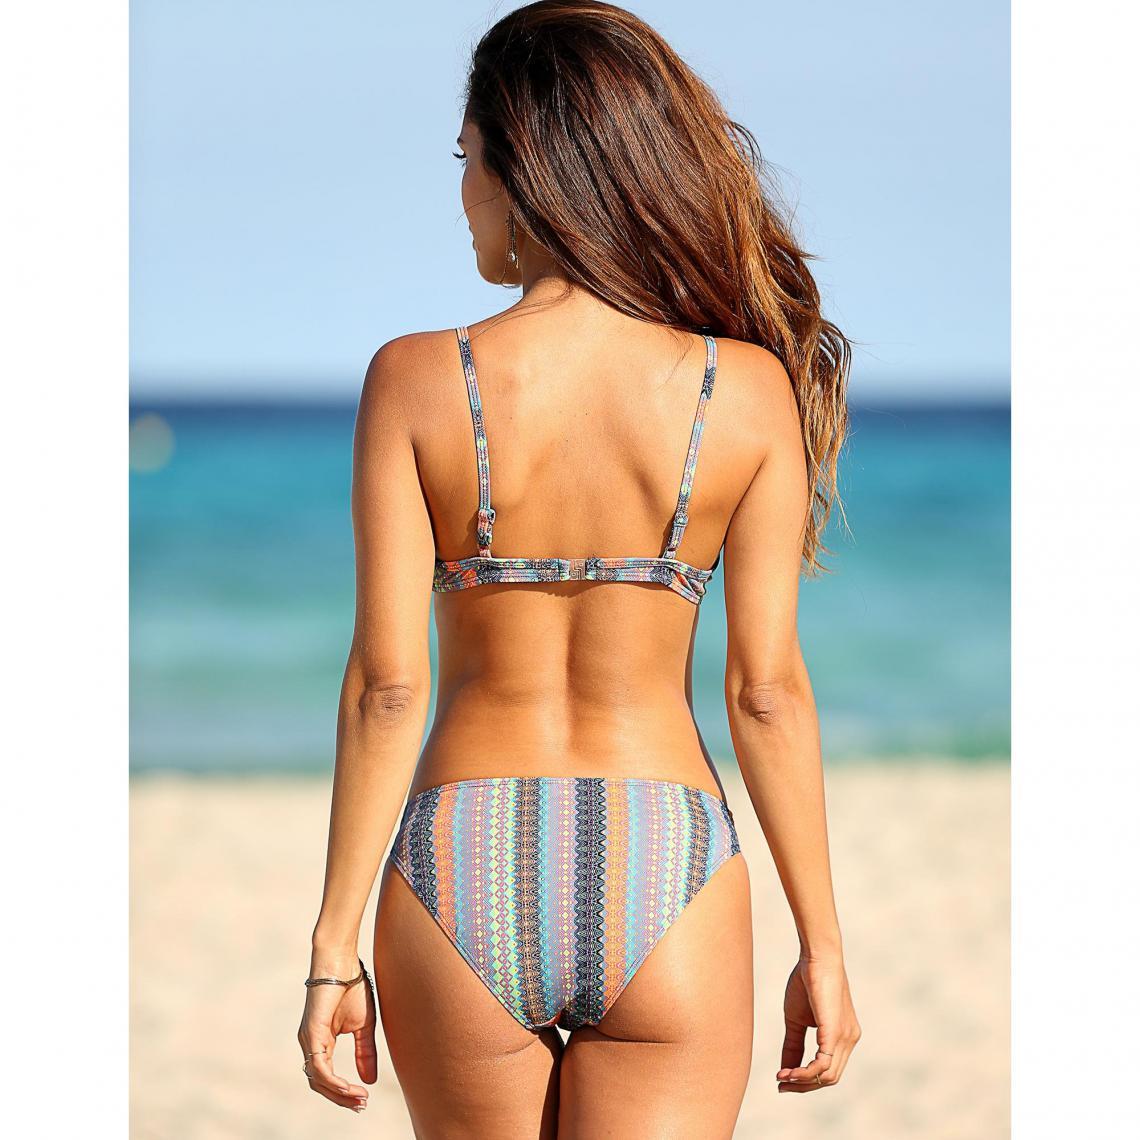 Ajustables Bikini Suisses Imprimé Femme Multicolore3 Bretelles QBshtrCdx